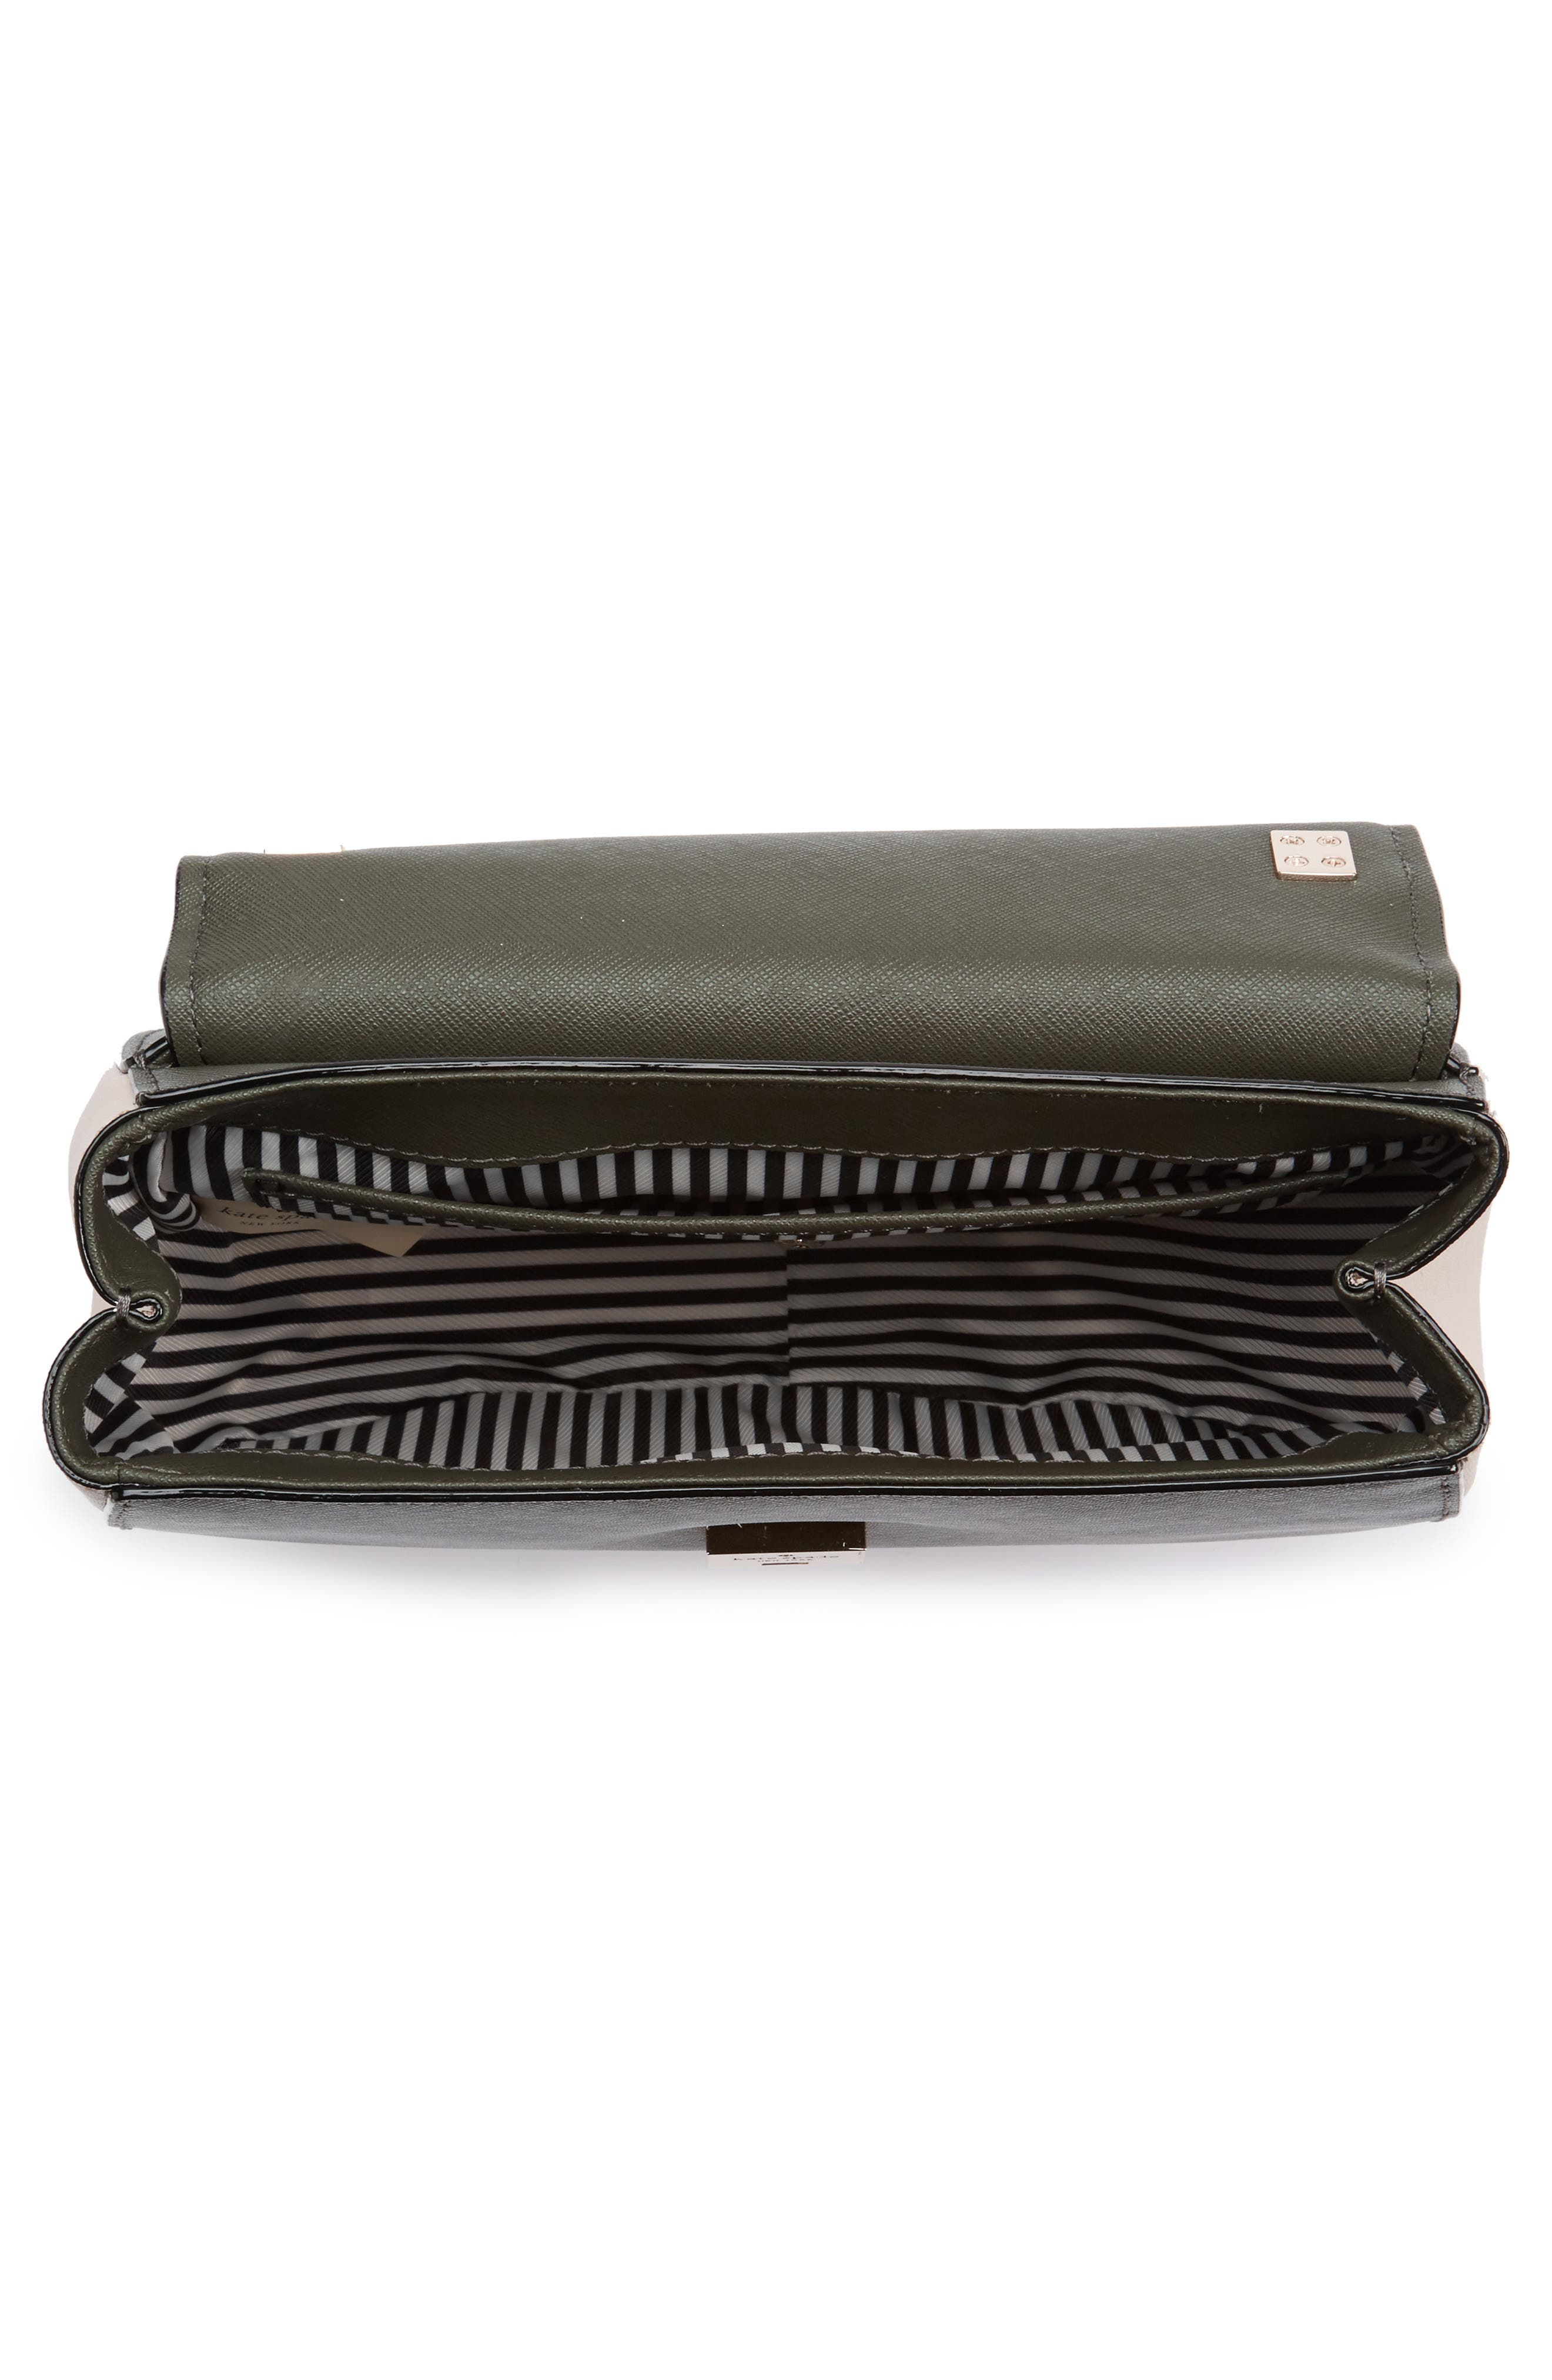 cameron street - byrdie leather crossbody bag,                             Alternate thumbnail 4, color,                             301